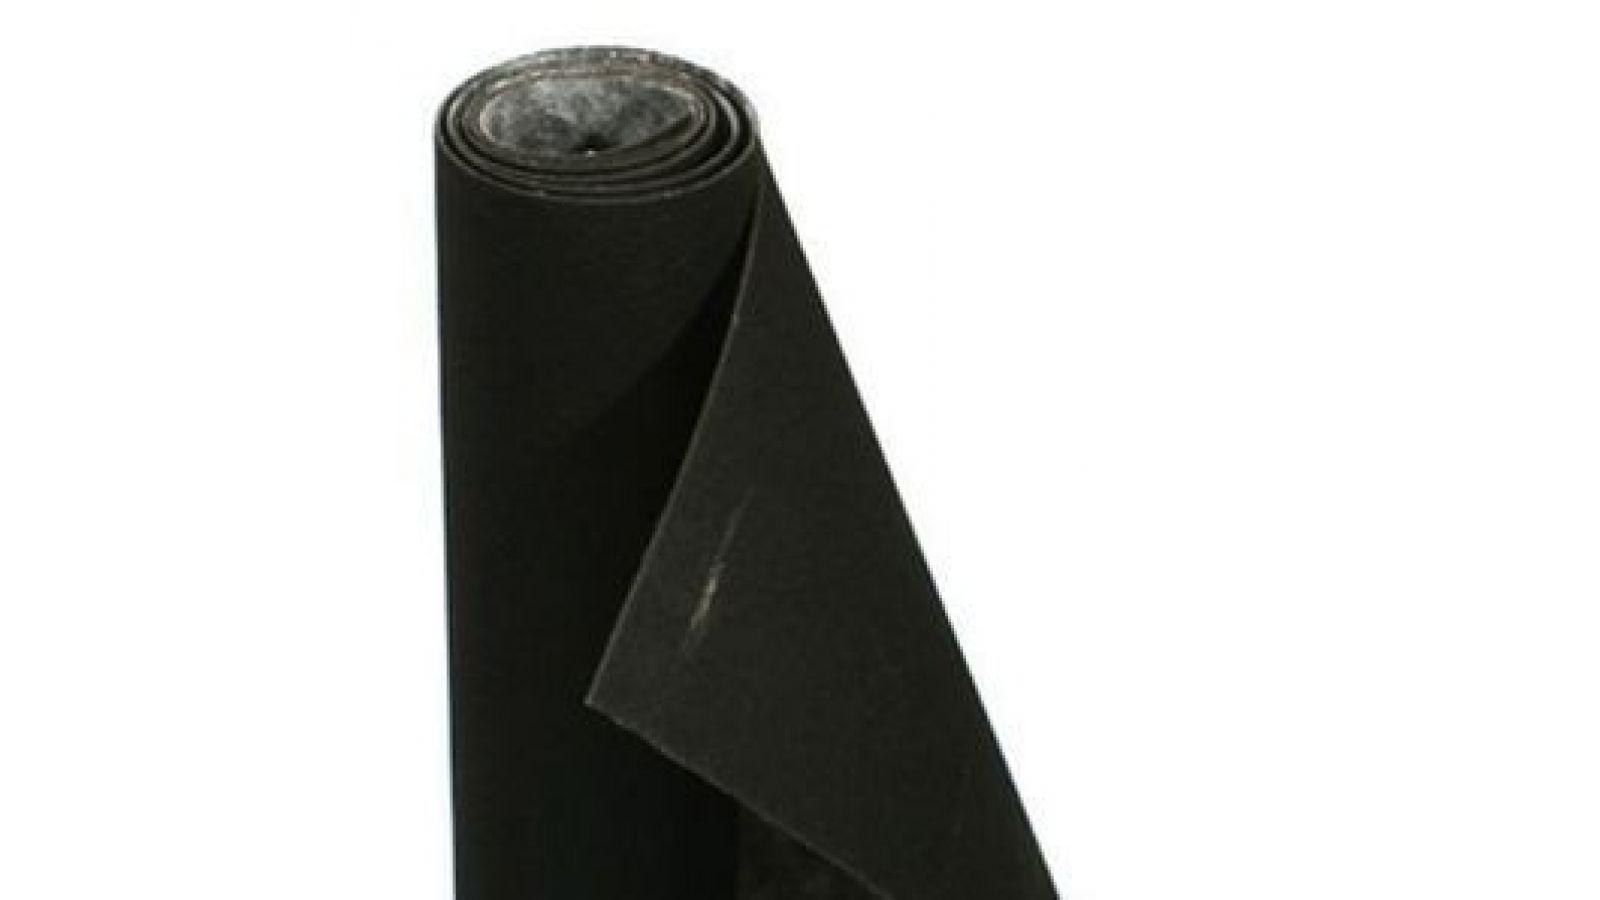 Wall Blokker - Commercial Acoustics